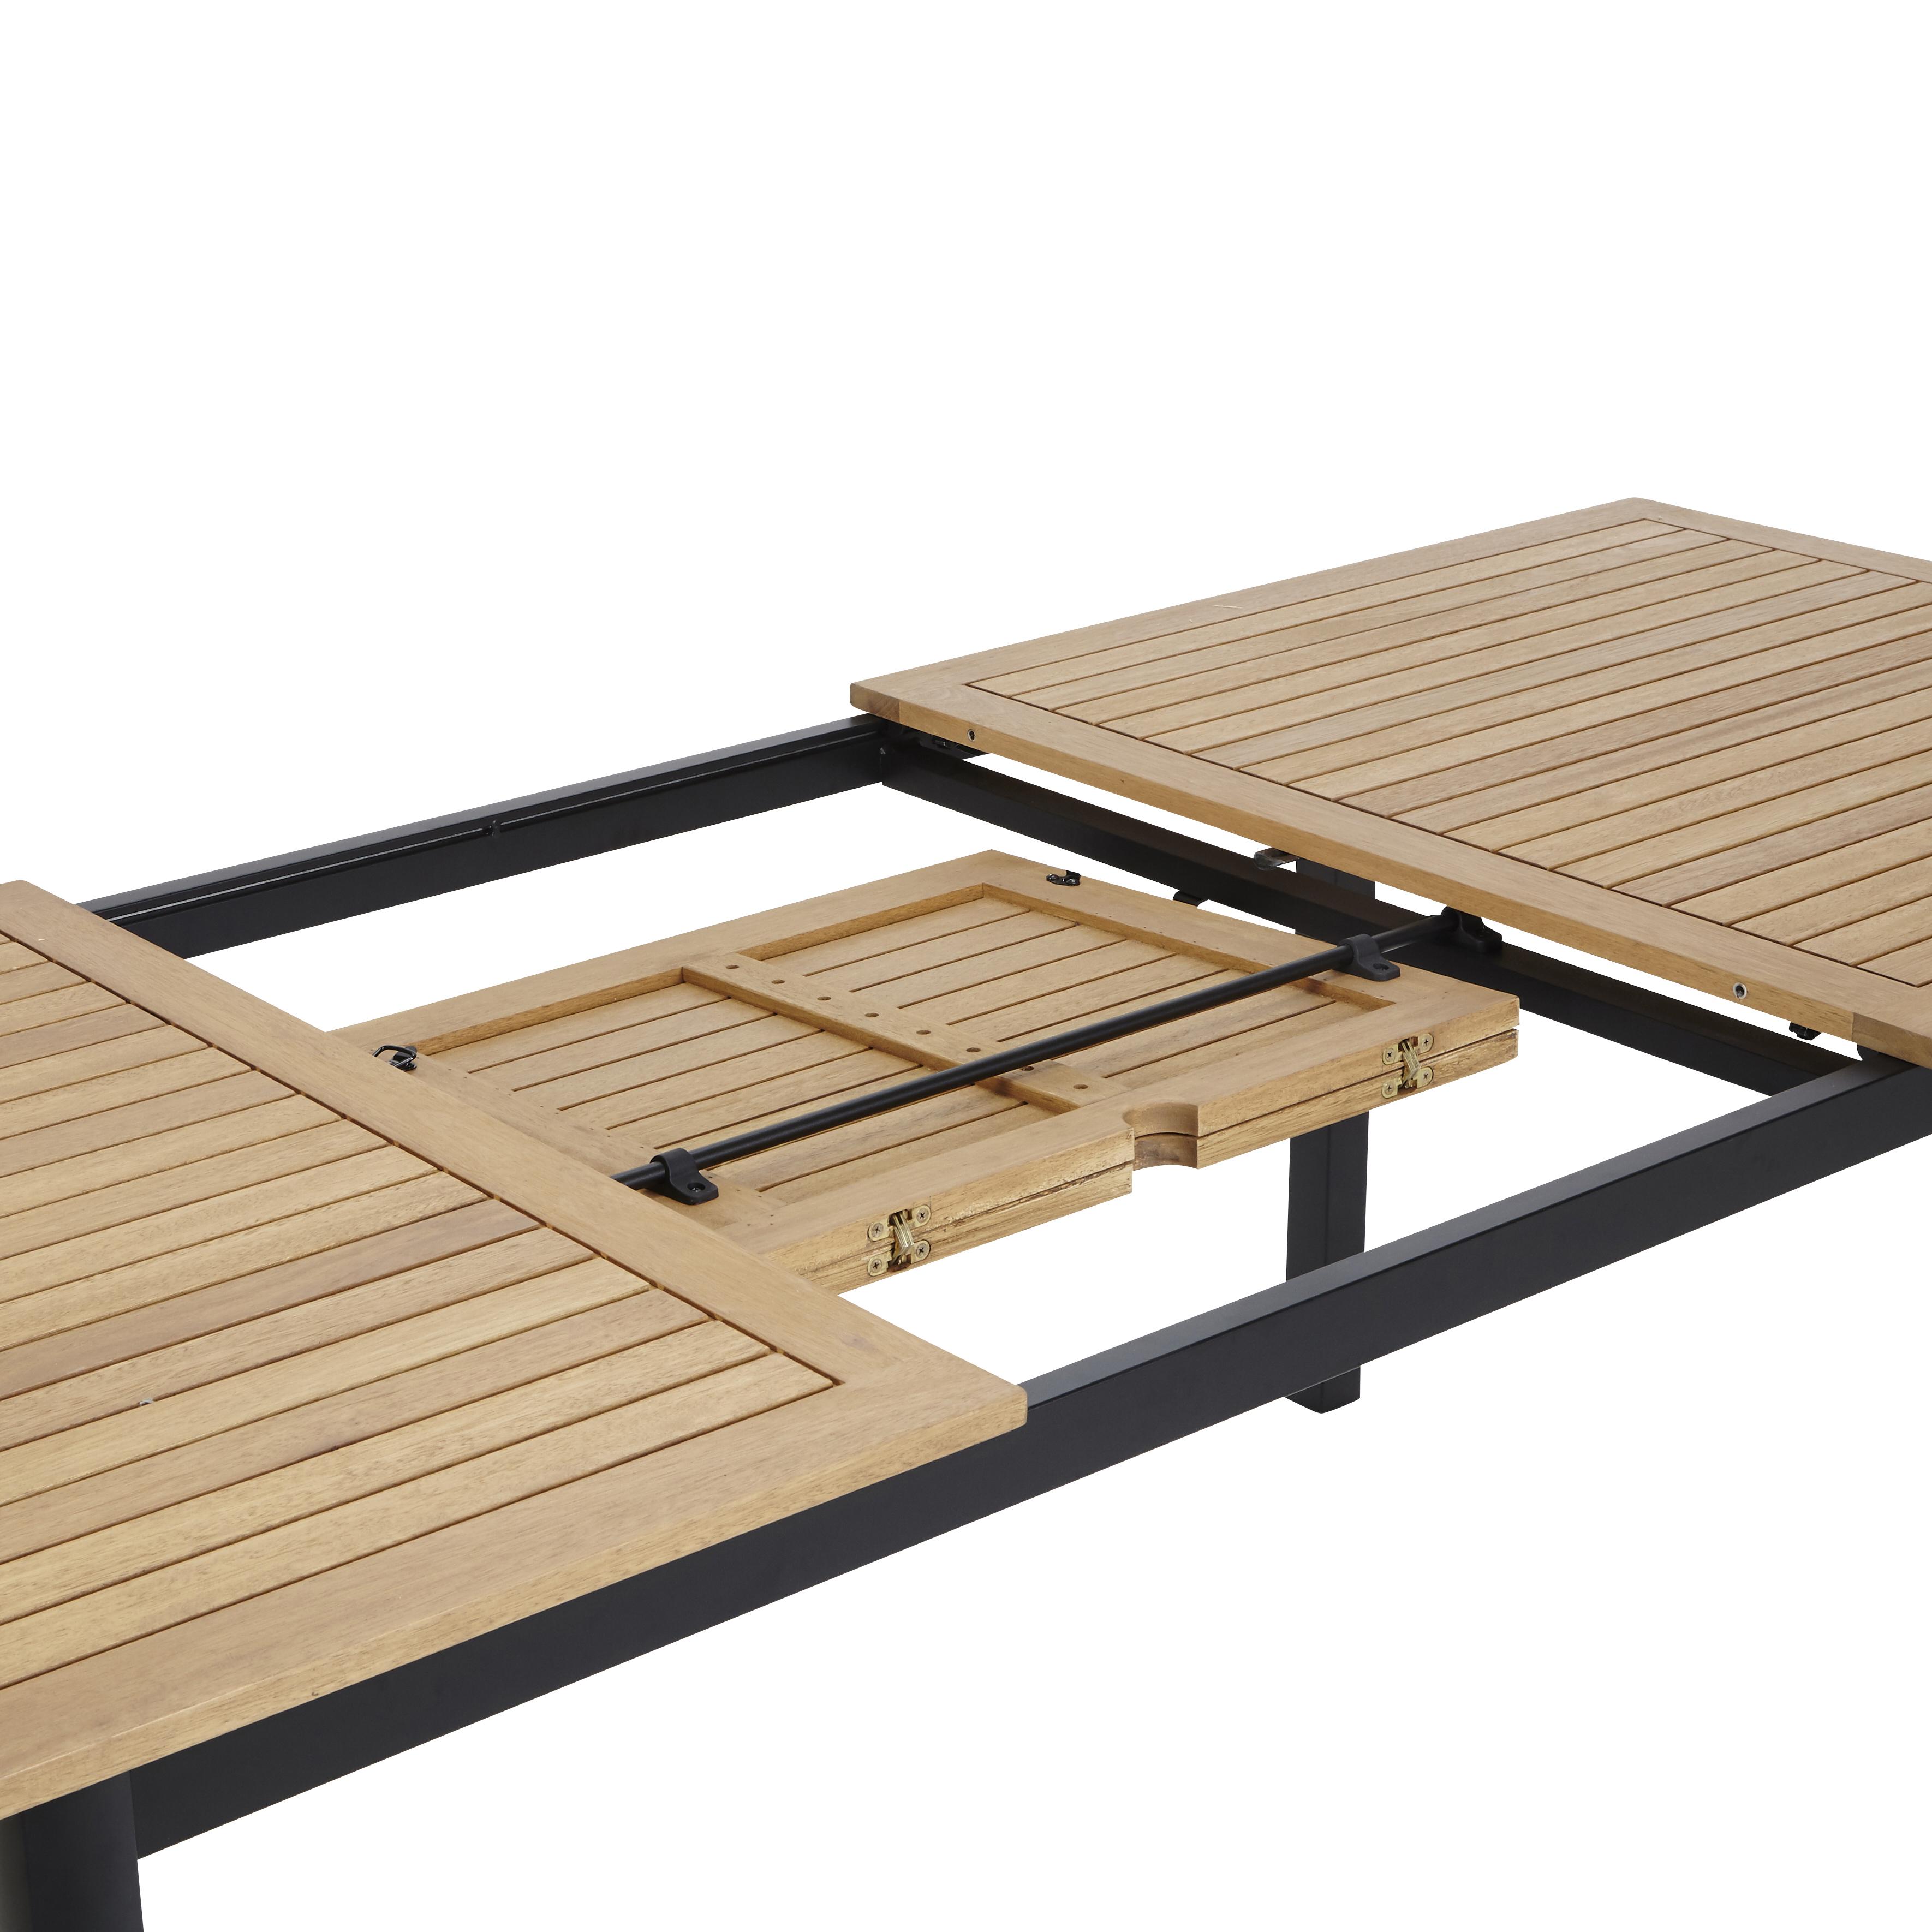 Emejing Table De Jardin Bois Carrefour Contemporary - Awesome ...